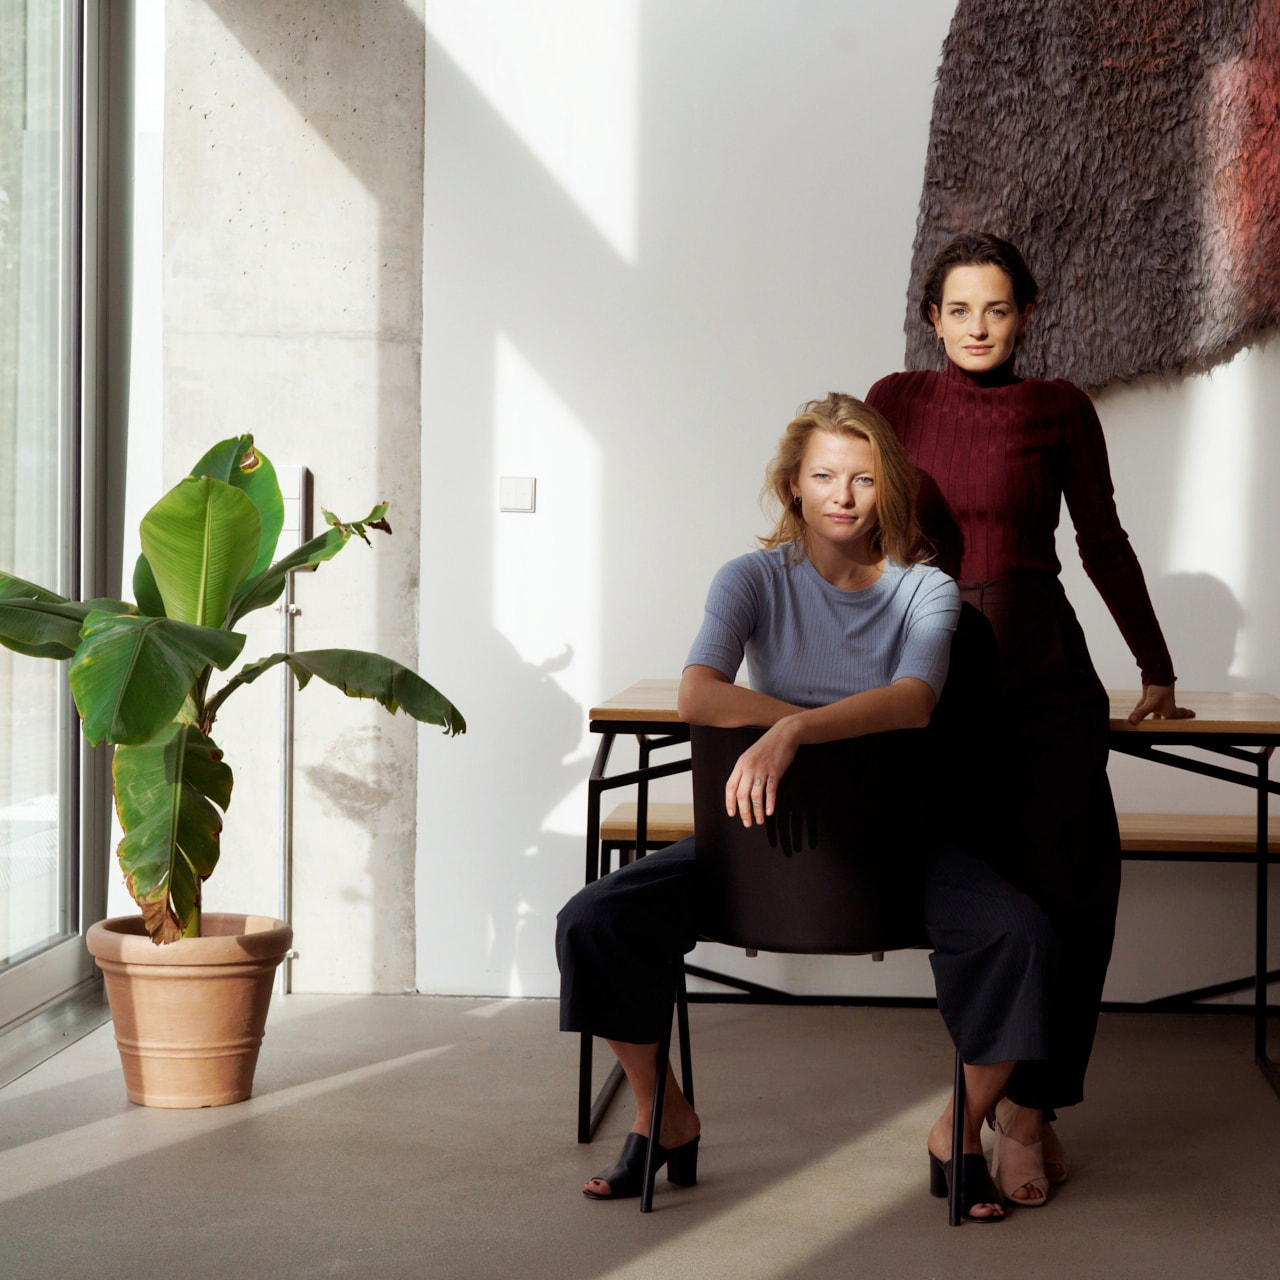 PAHR-Founders-Caecilia-Baldszus-Jessica-Joyce-Sidon